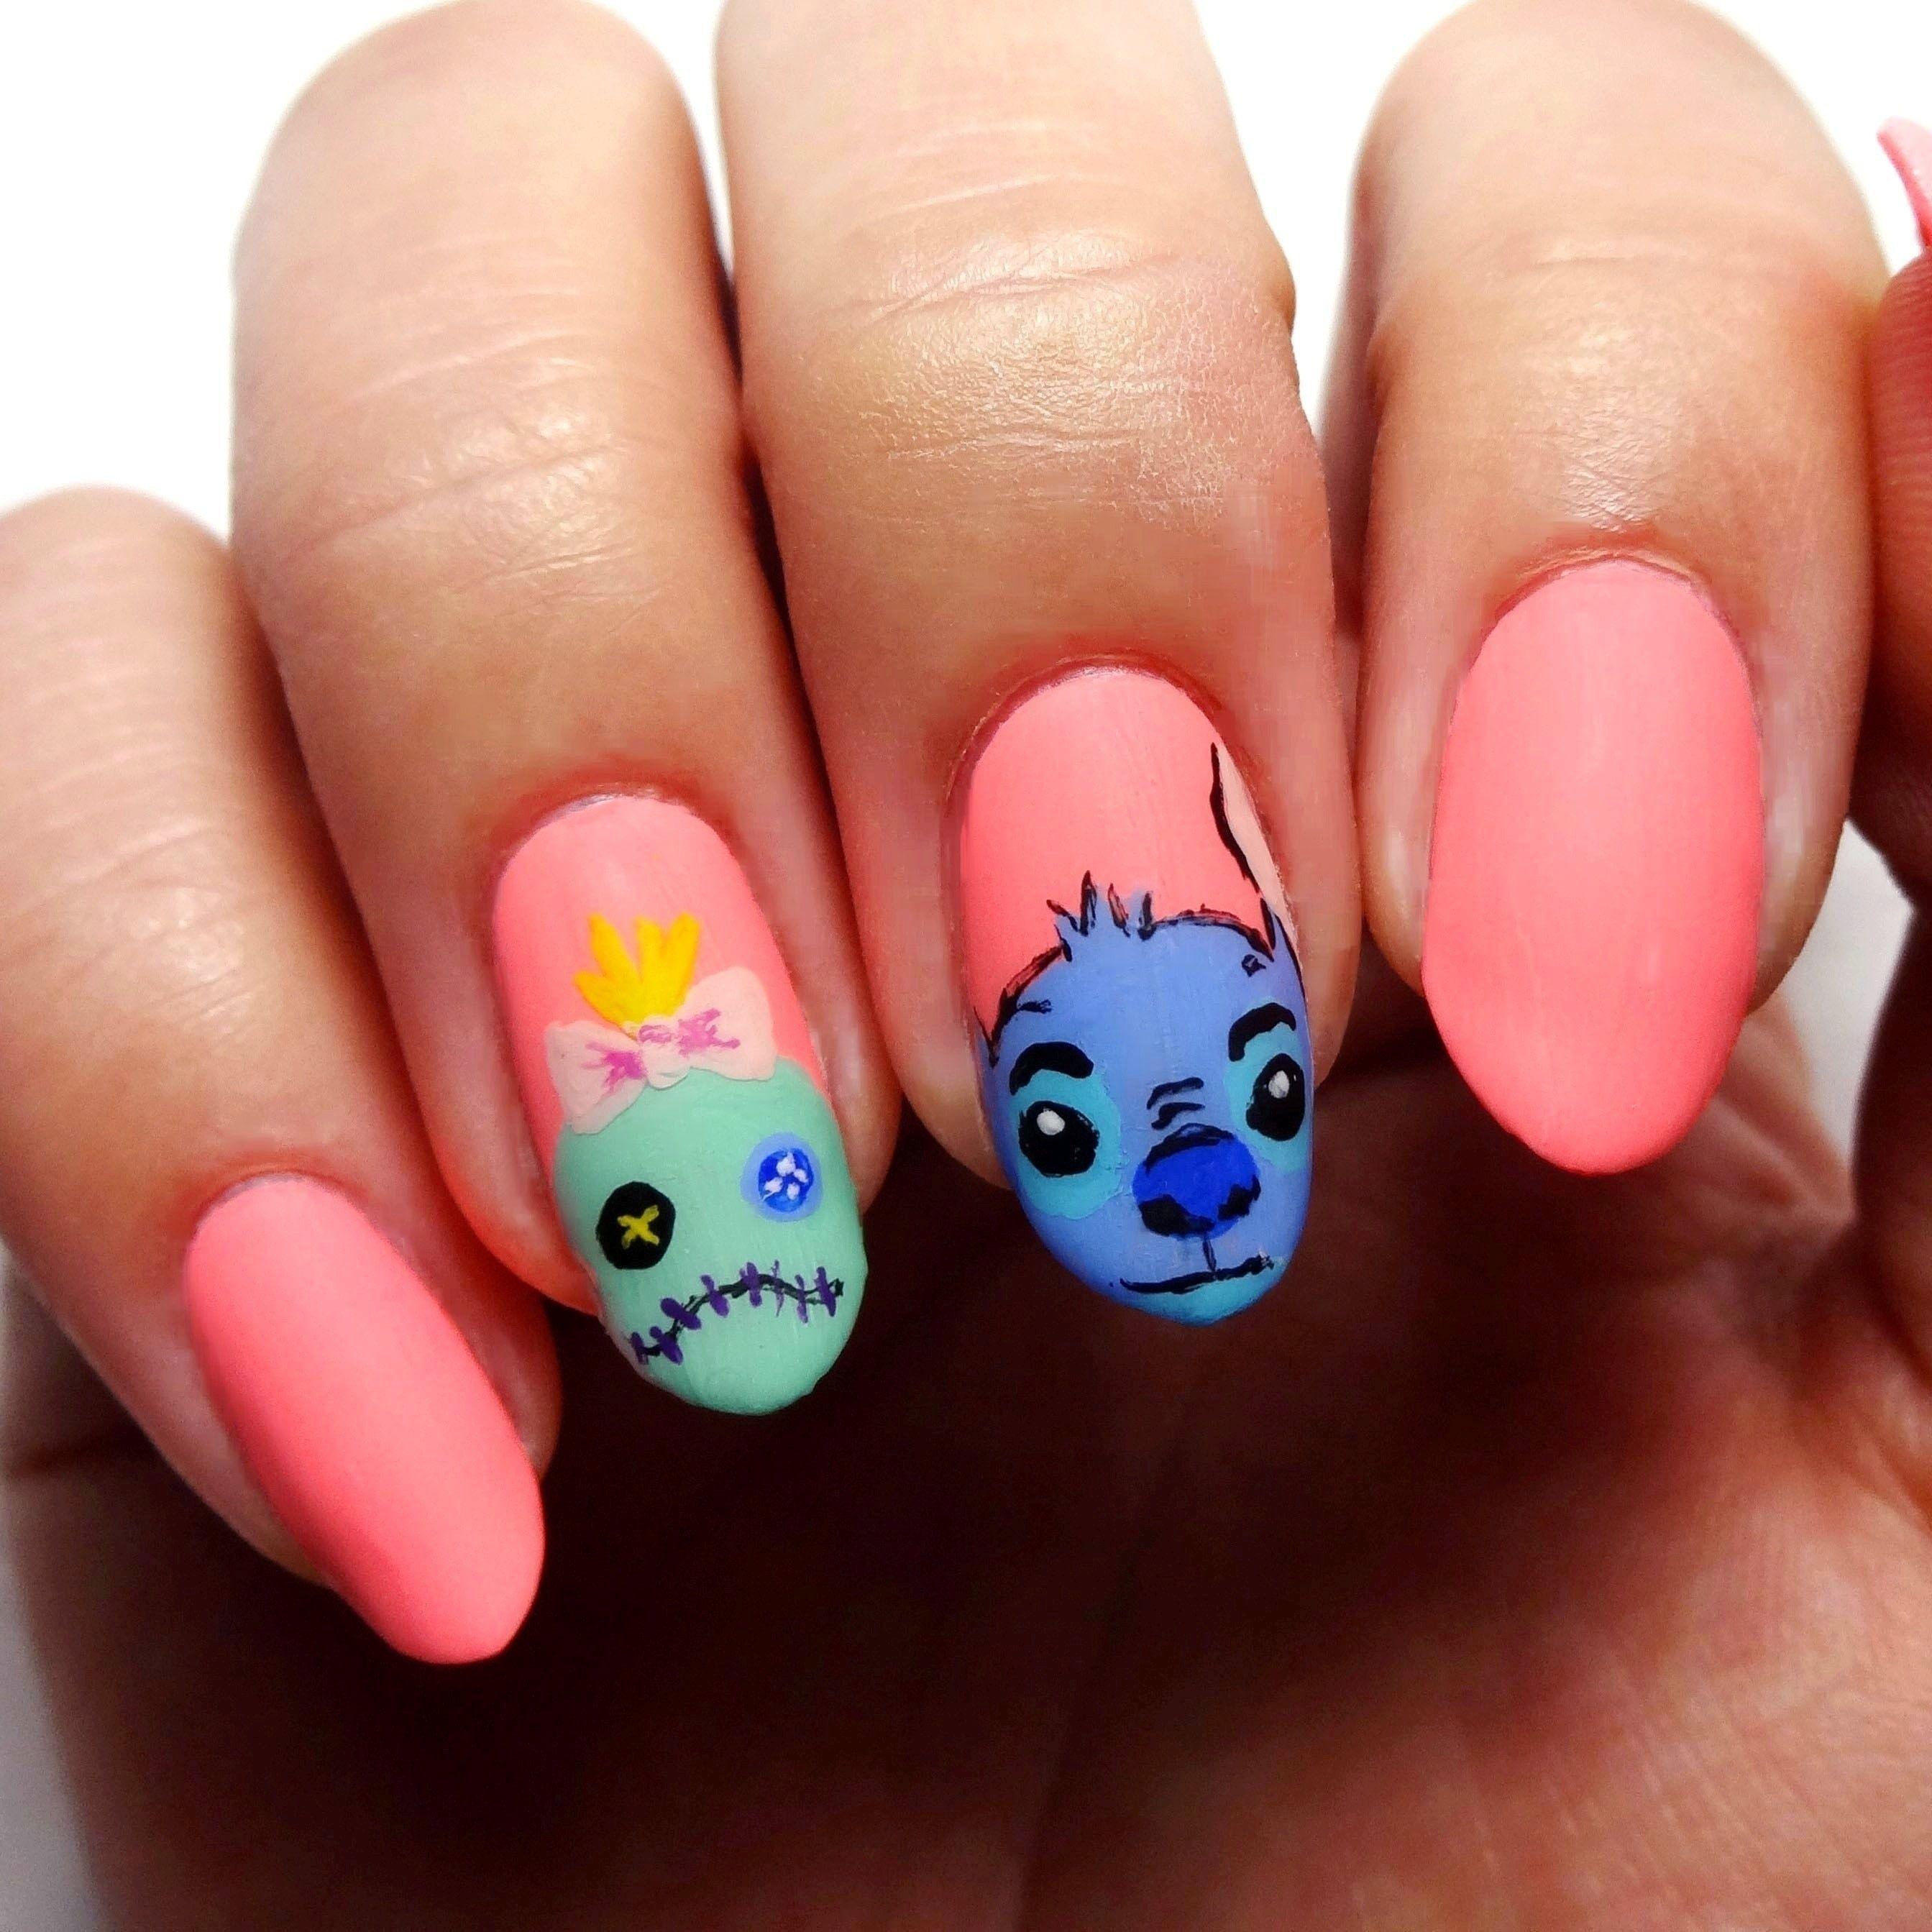 Nail Art Stitch: Yellow Nail Art, Nail Art Disney, Nail